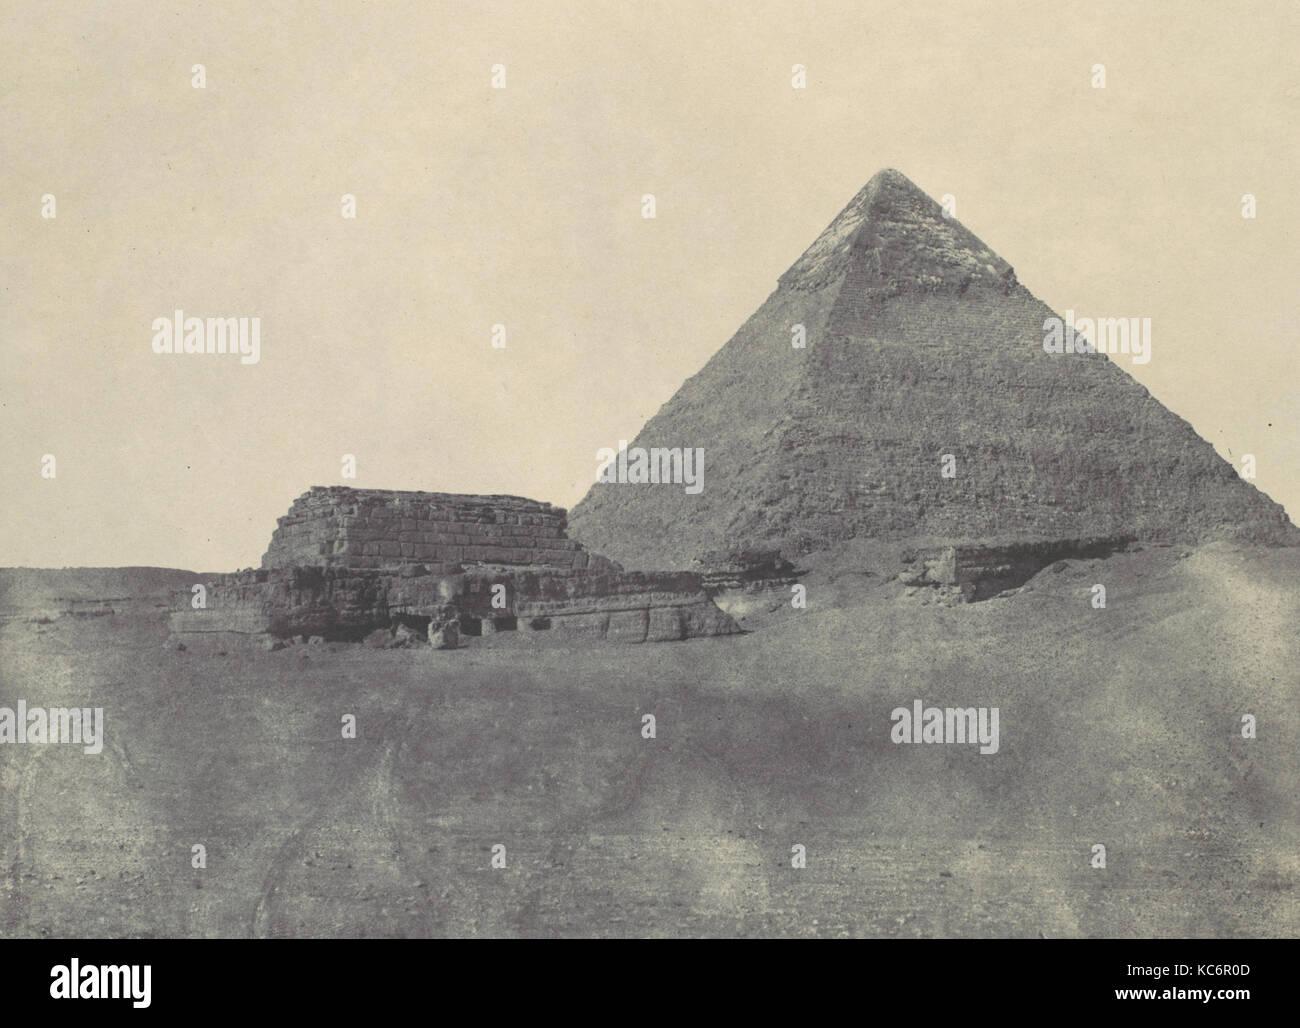 Égypte Moyenne. Pyramide de Chéphren, Maxime Du Camp, 1850 - Stock Image